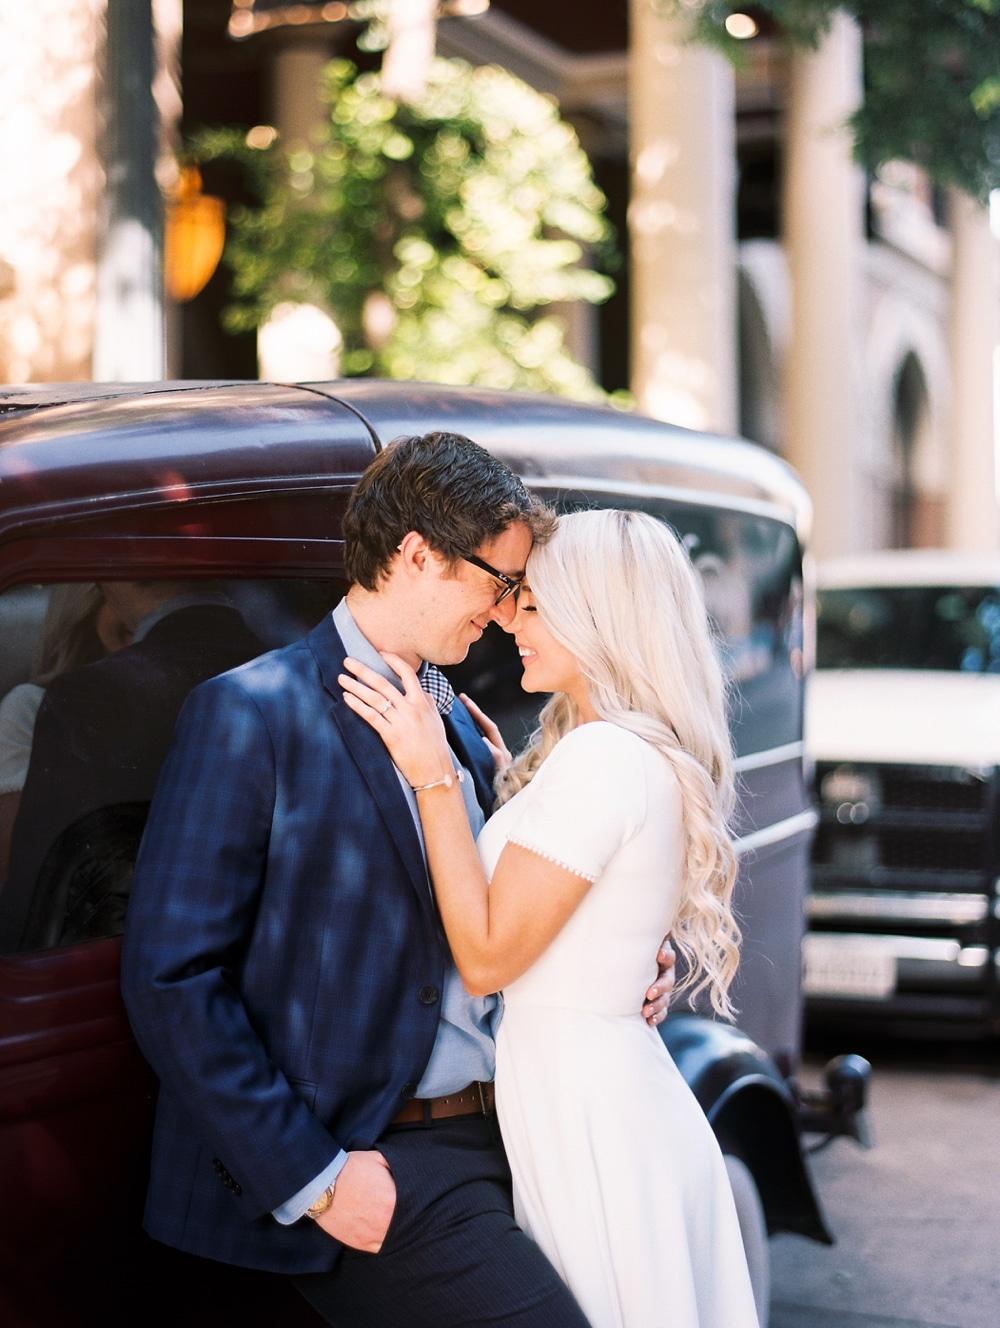 kristin-la-voie-photography-austin-wedding-photographer-the-driskill-41